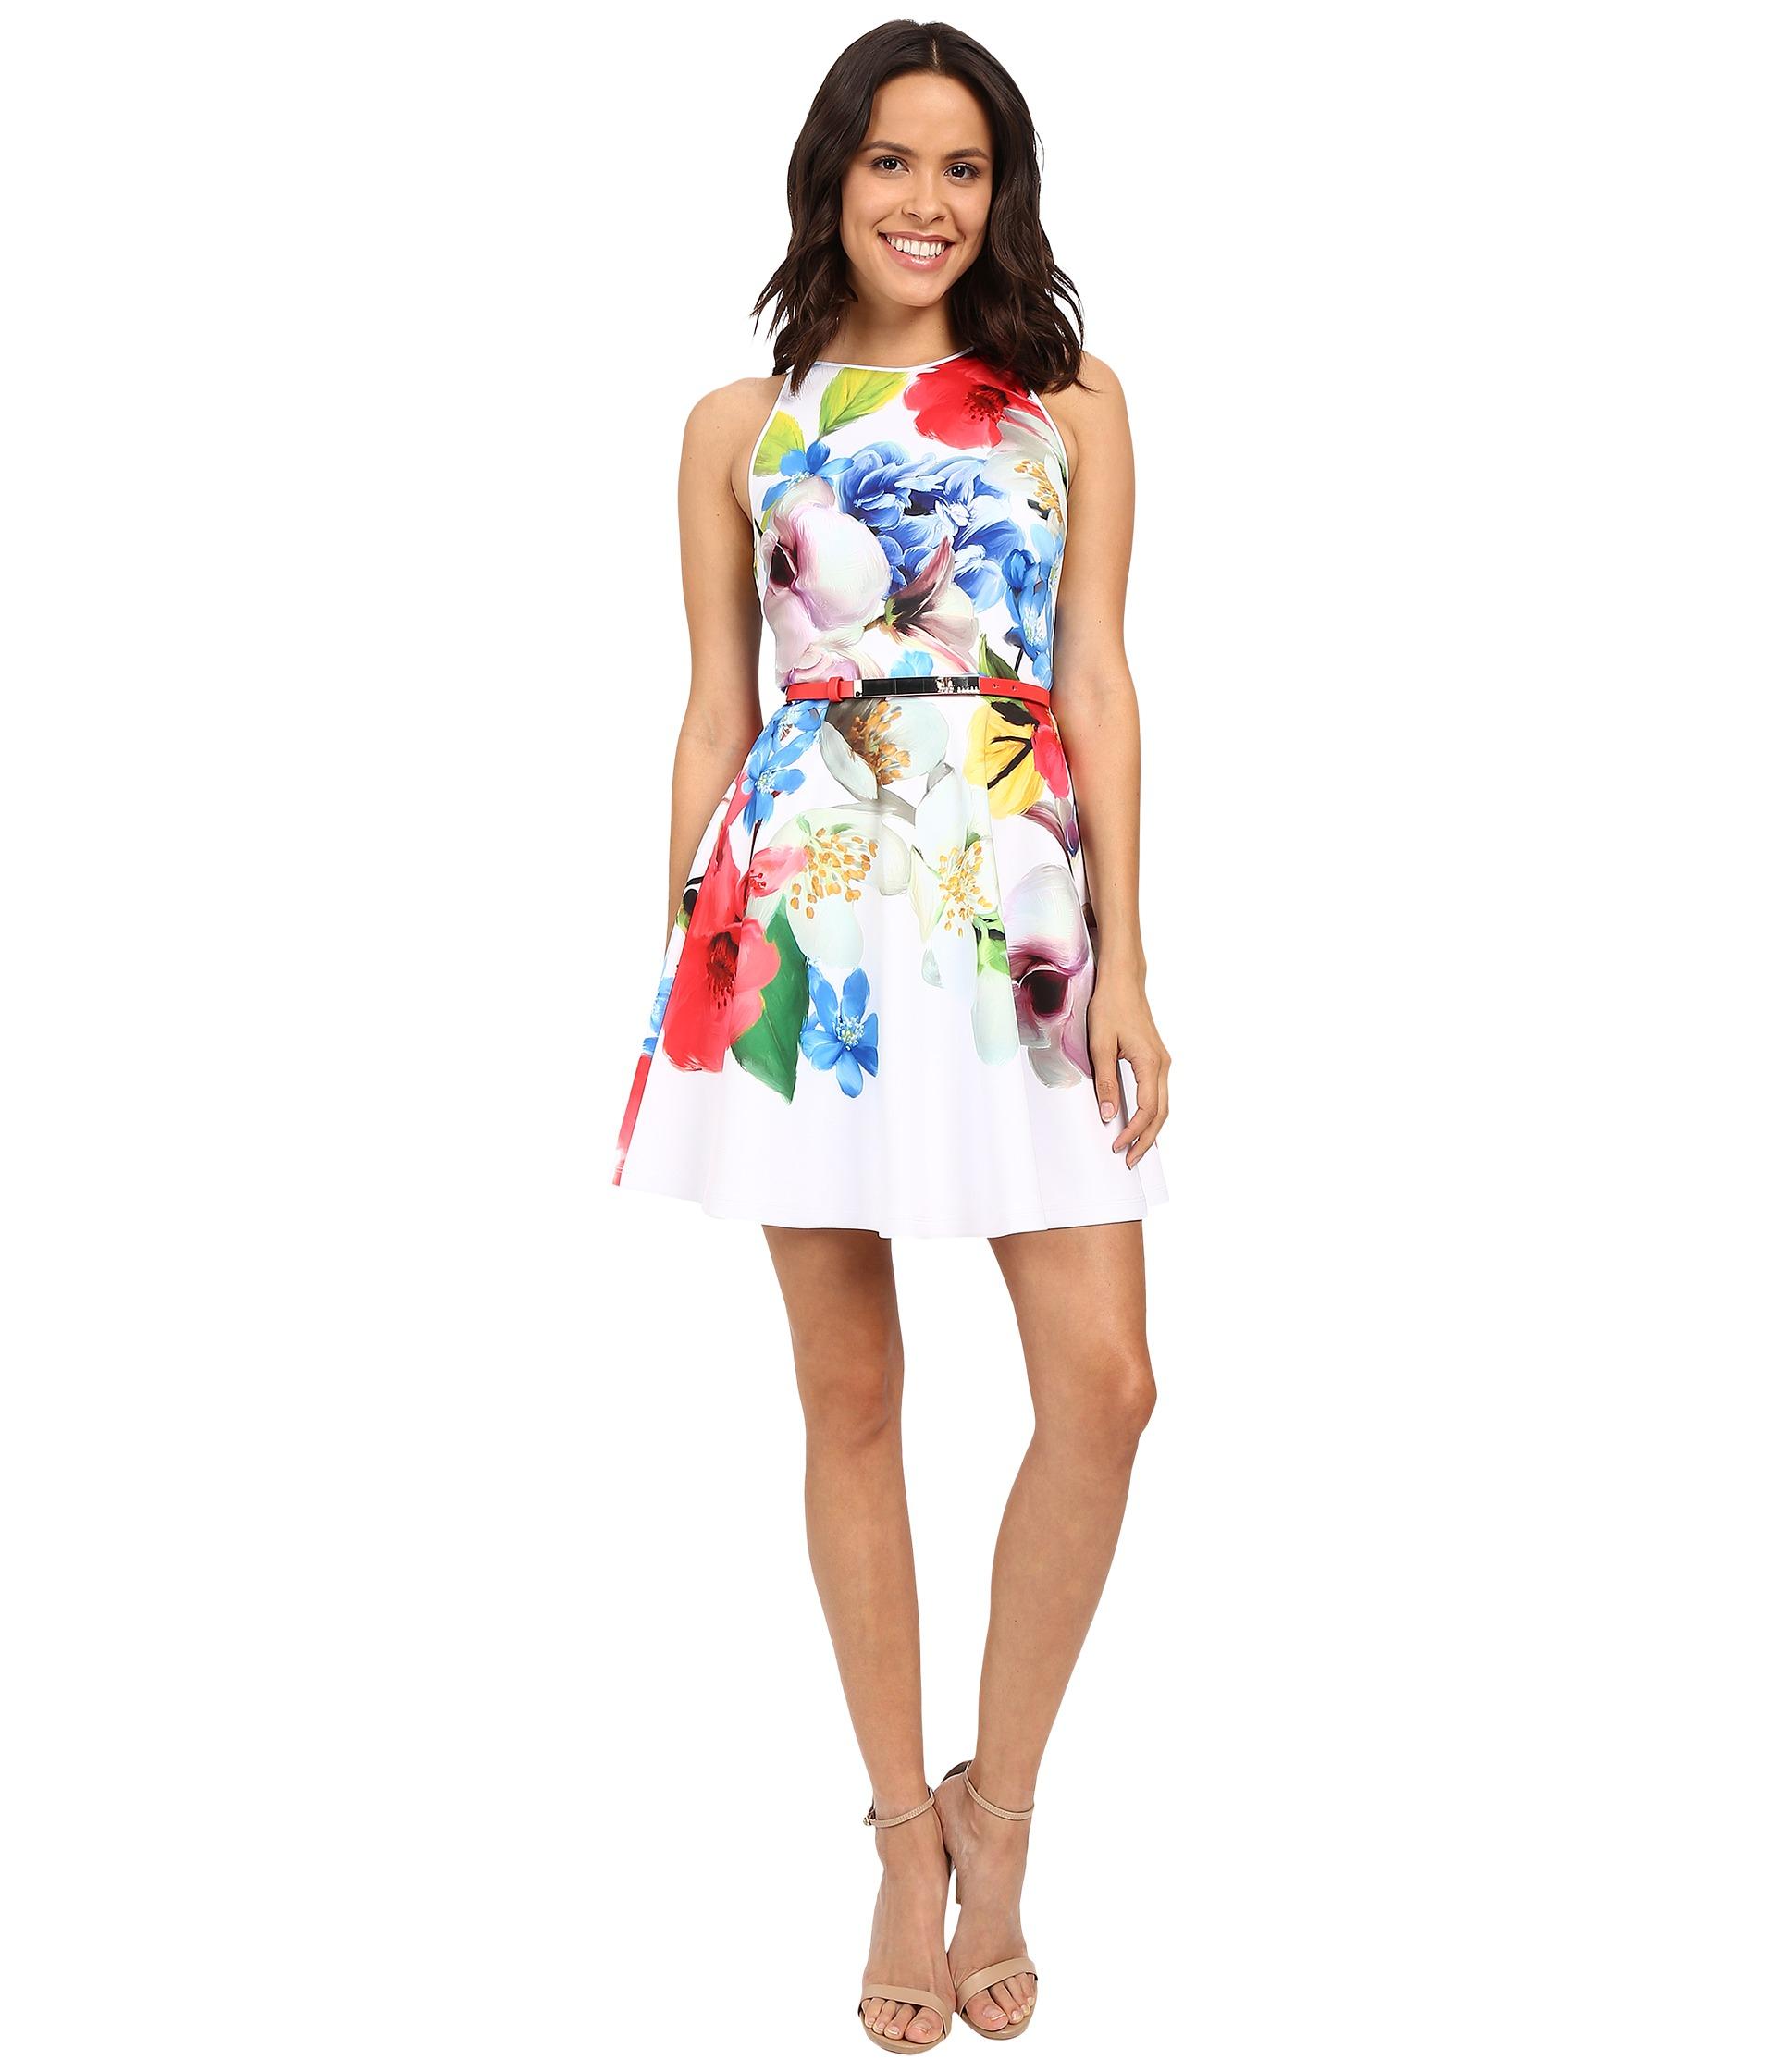 Ted Baker White Floral Dress